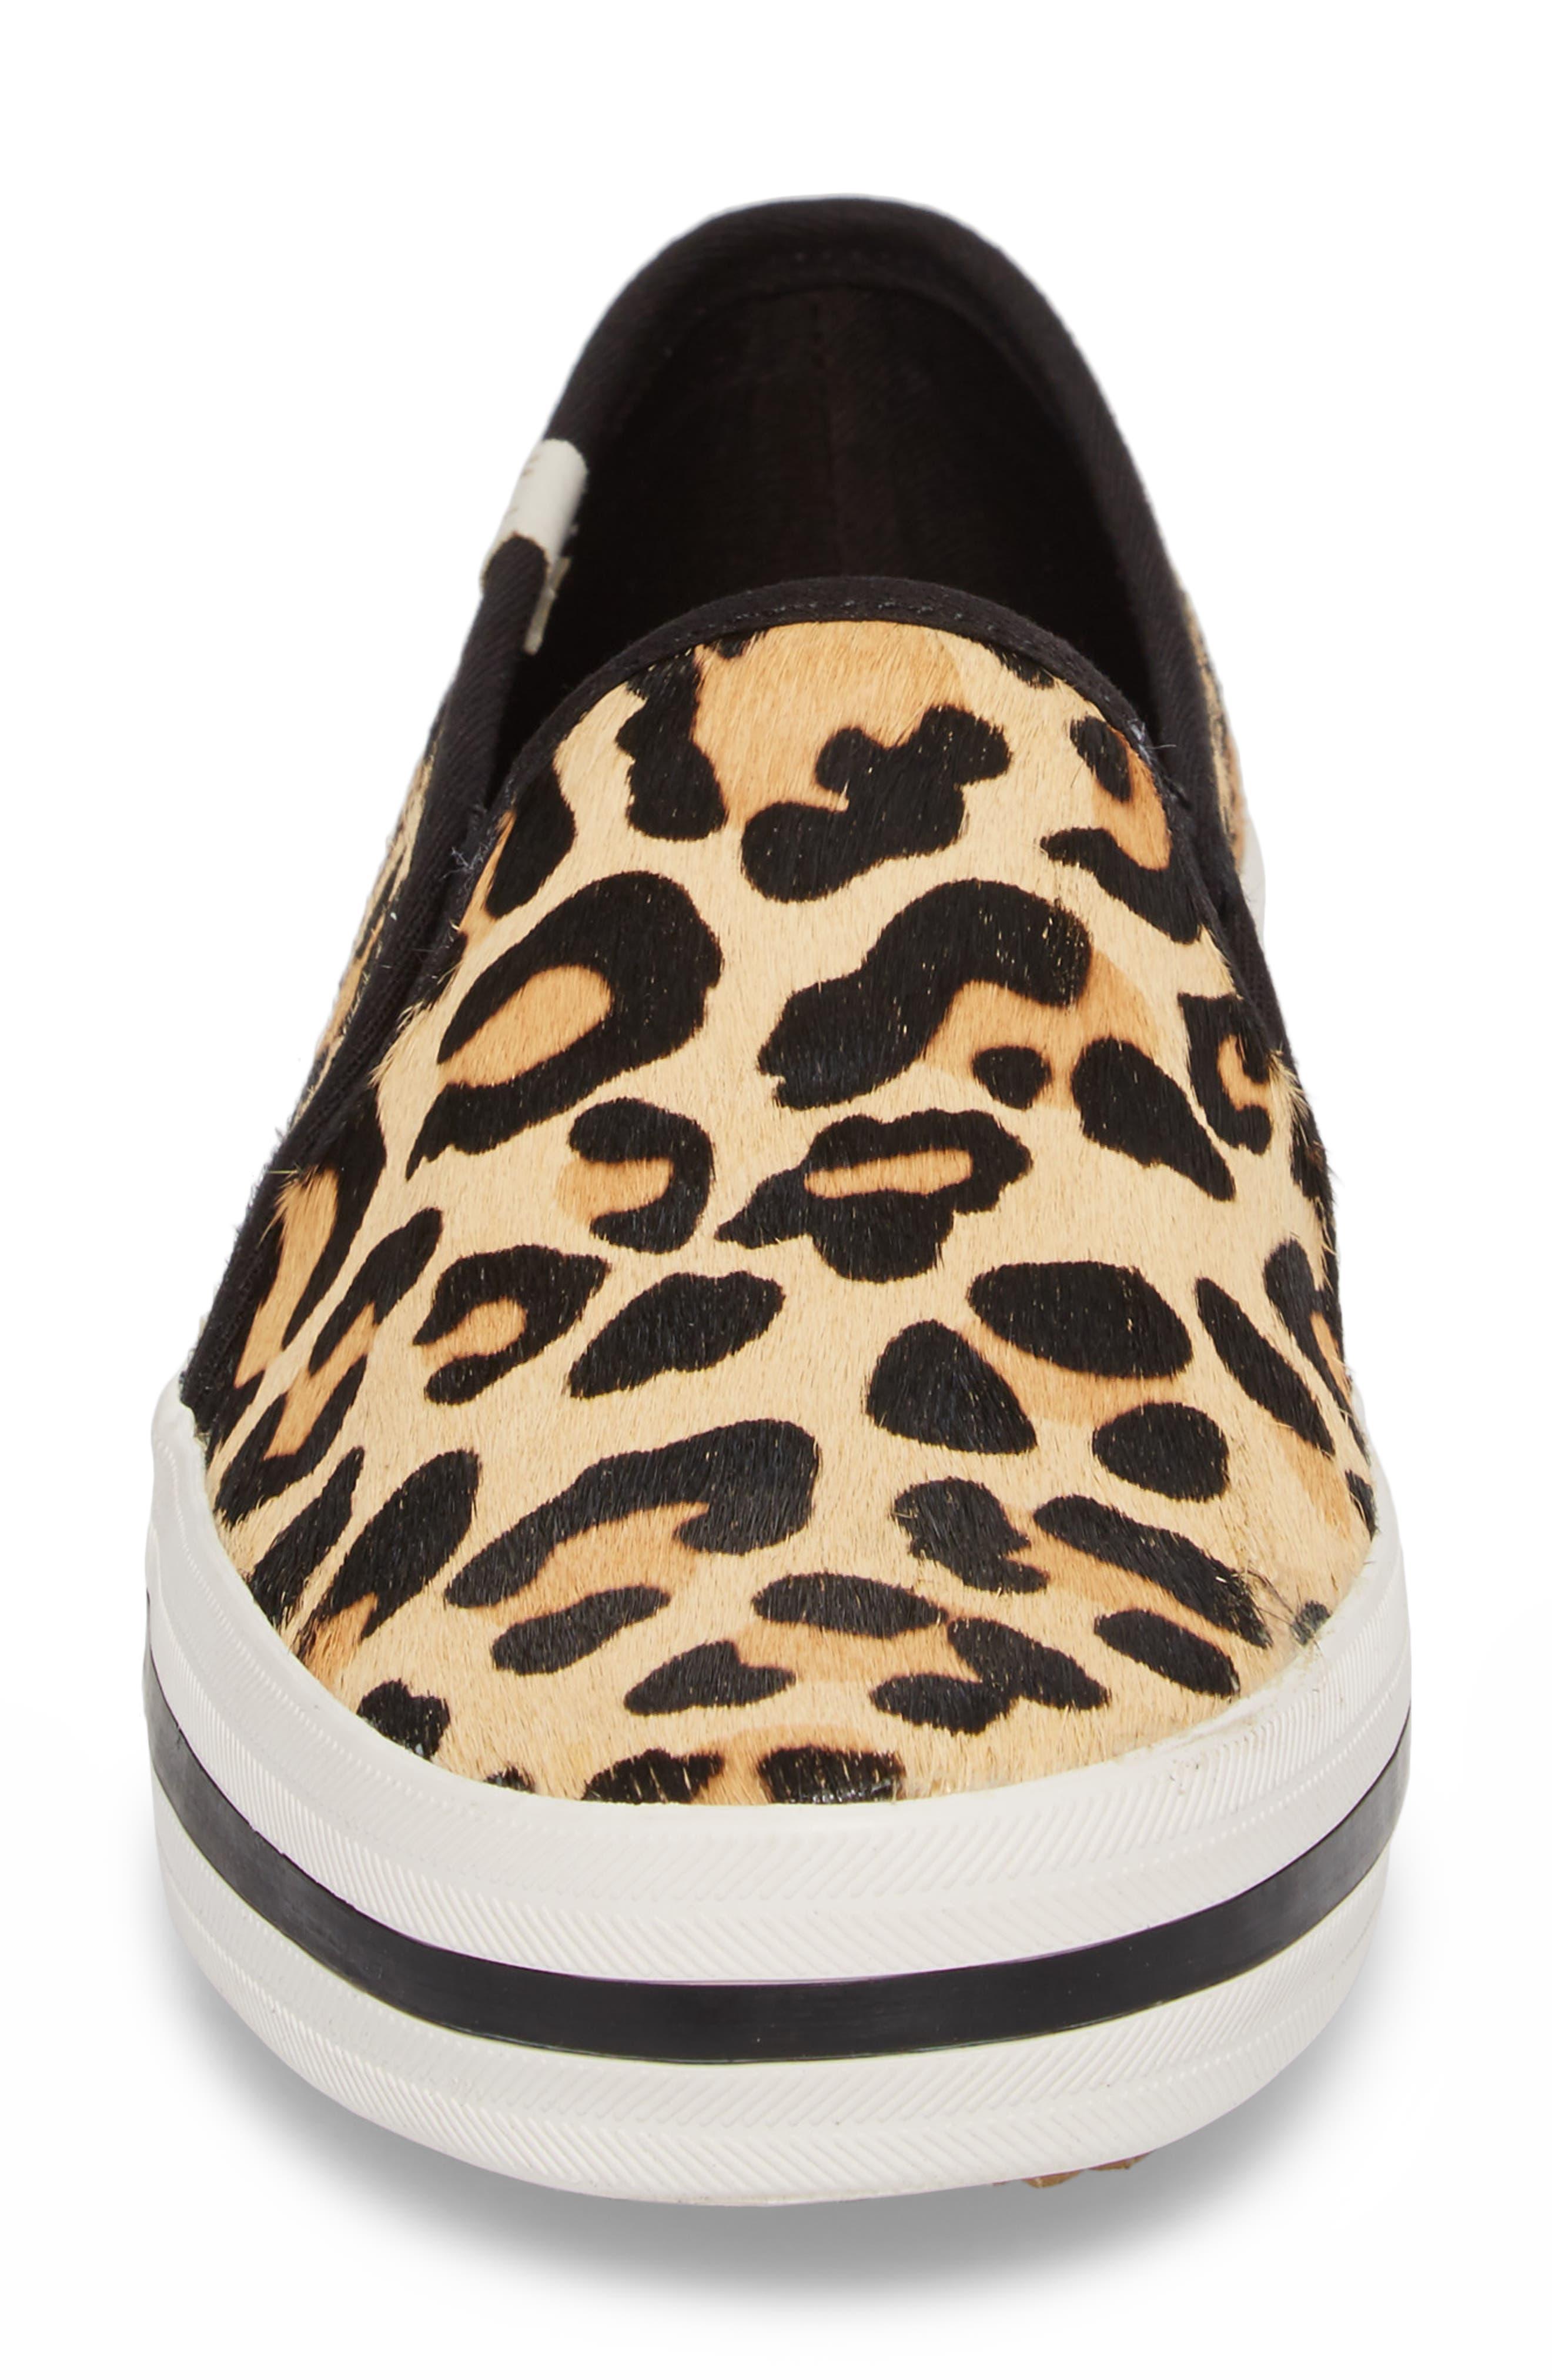 KEDS<SUP>®</SUP> FOR KATE SPADE NEW YORK, Keds<sup>®</sup> x kate spade Double Decker Slip-On Sneaker, Alternate thumbnail 4, color, TAN PONY HAIR